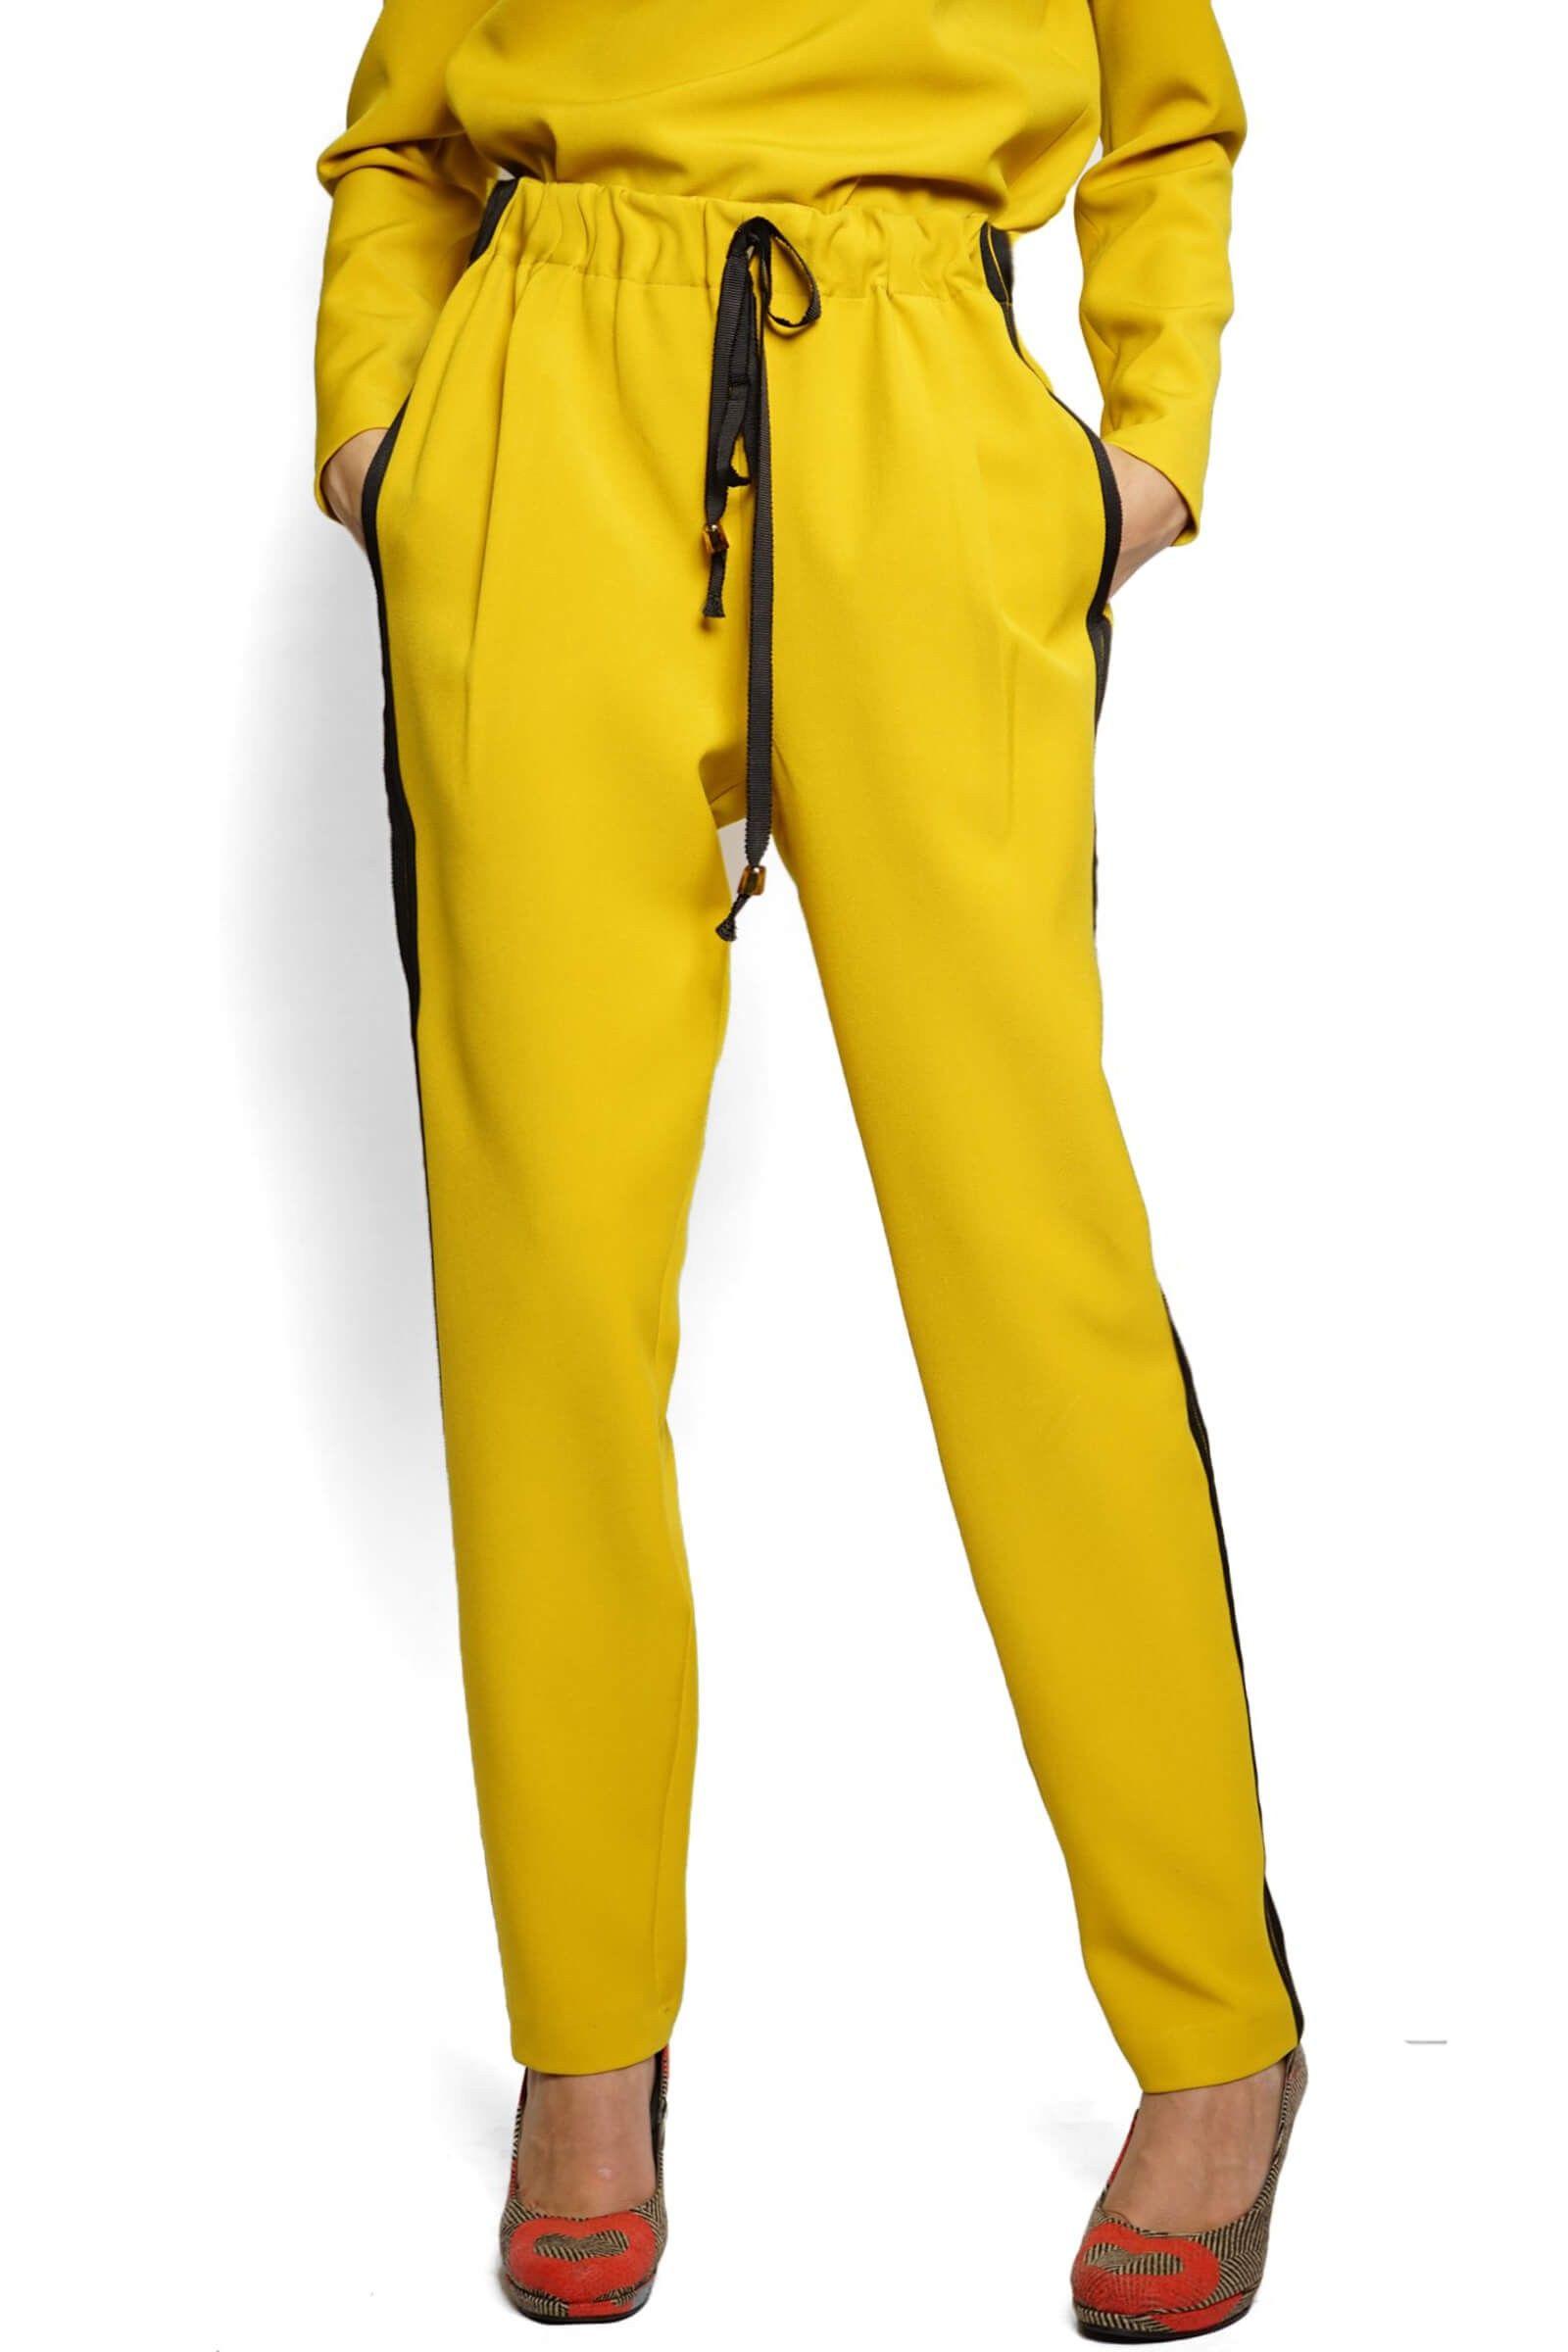 Mustard pants with headbands